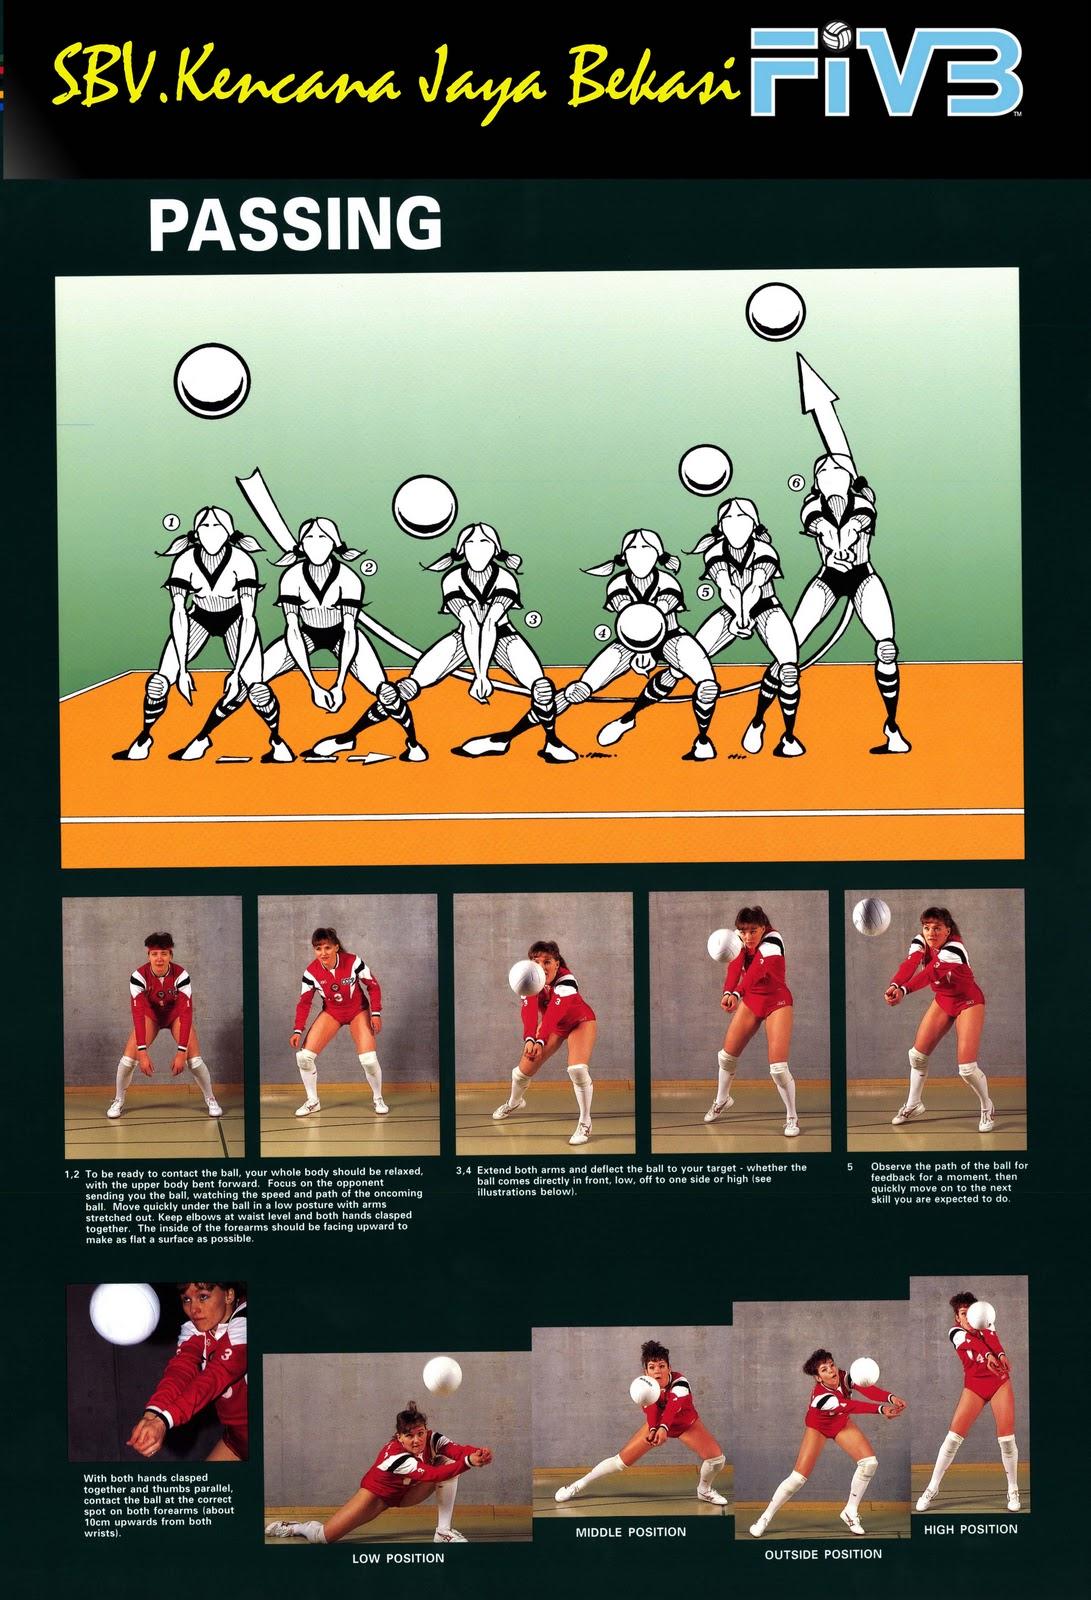 Teknik dasar permainan Bola voli nic